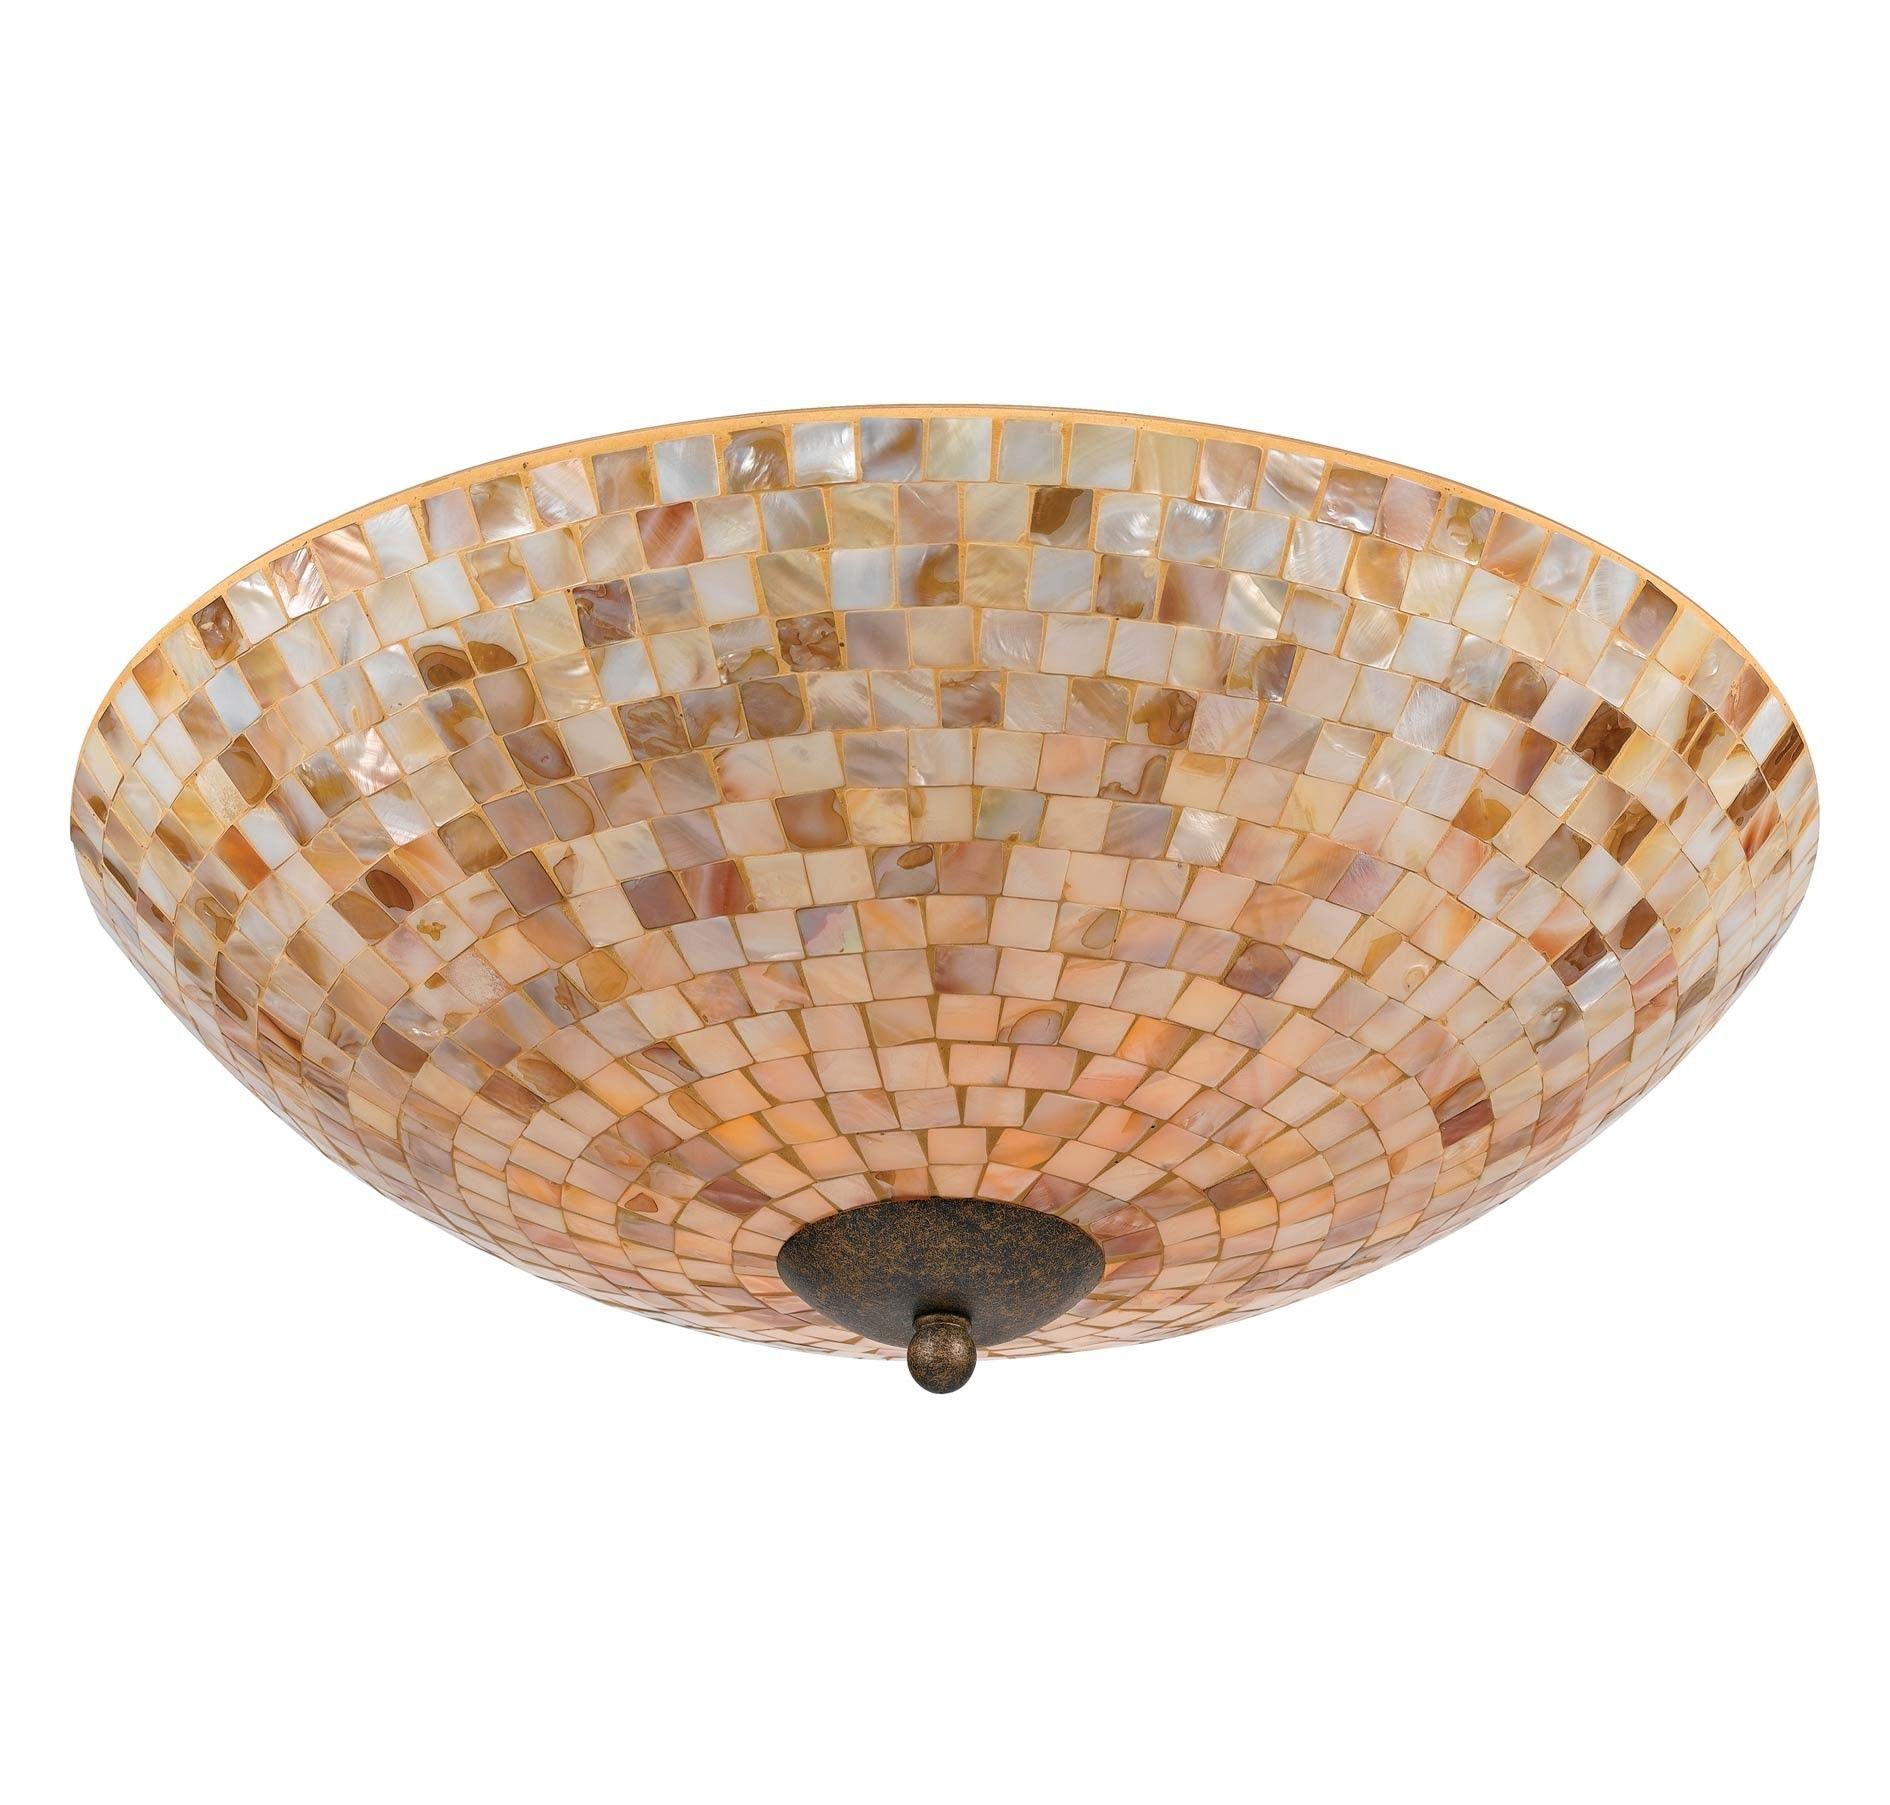 Quoizel monterey mosaic flush mount in ceiling lights flush mounts quoizel monterey mosaic flush mount in ceiling lights flush mounts progressivelighting arubaitofo Choice Image